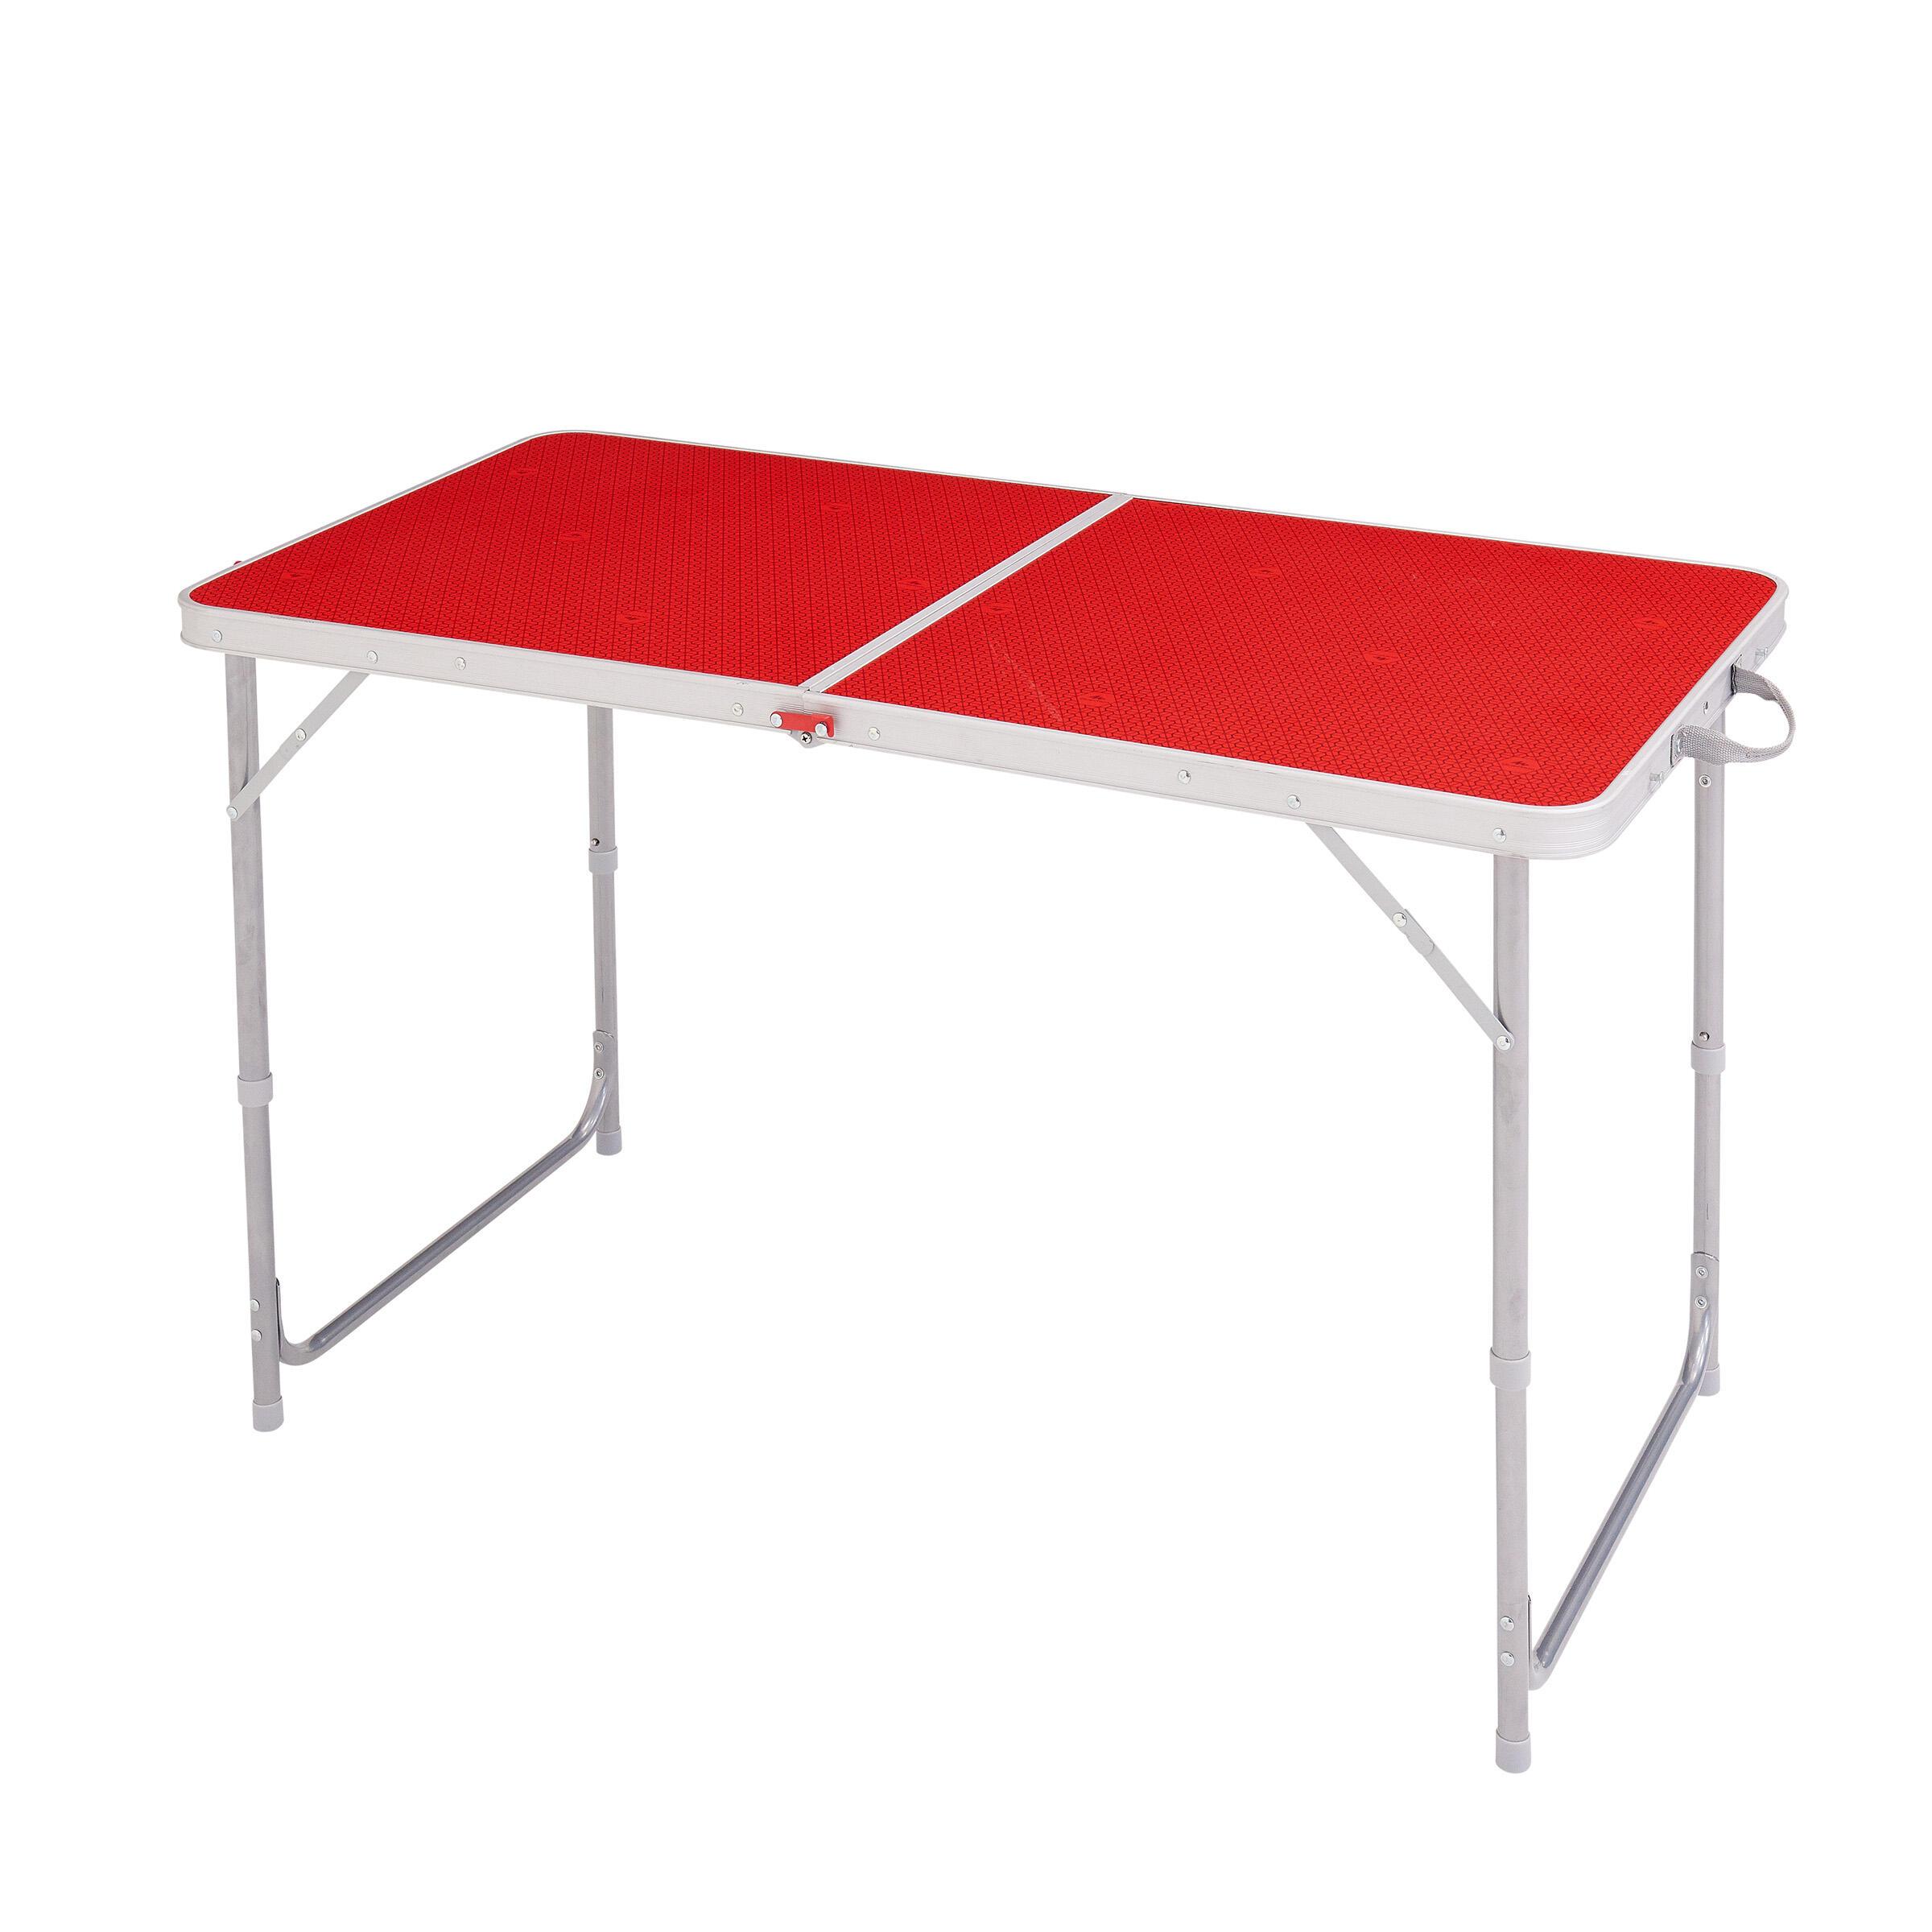 Tables et meubles   Camping   Decathlon